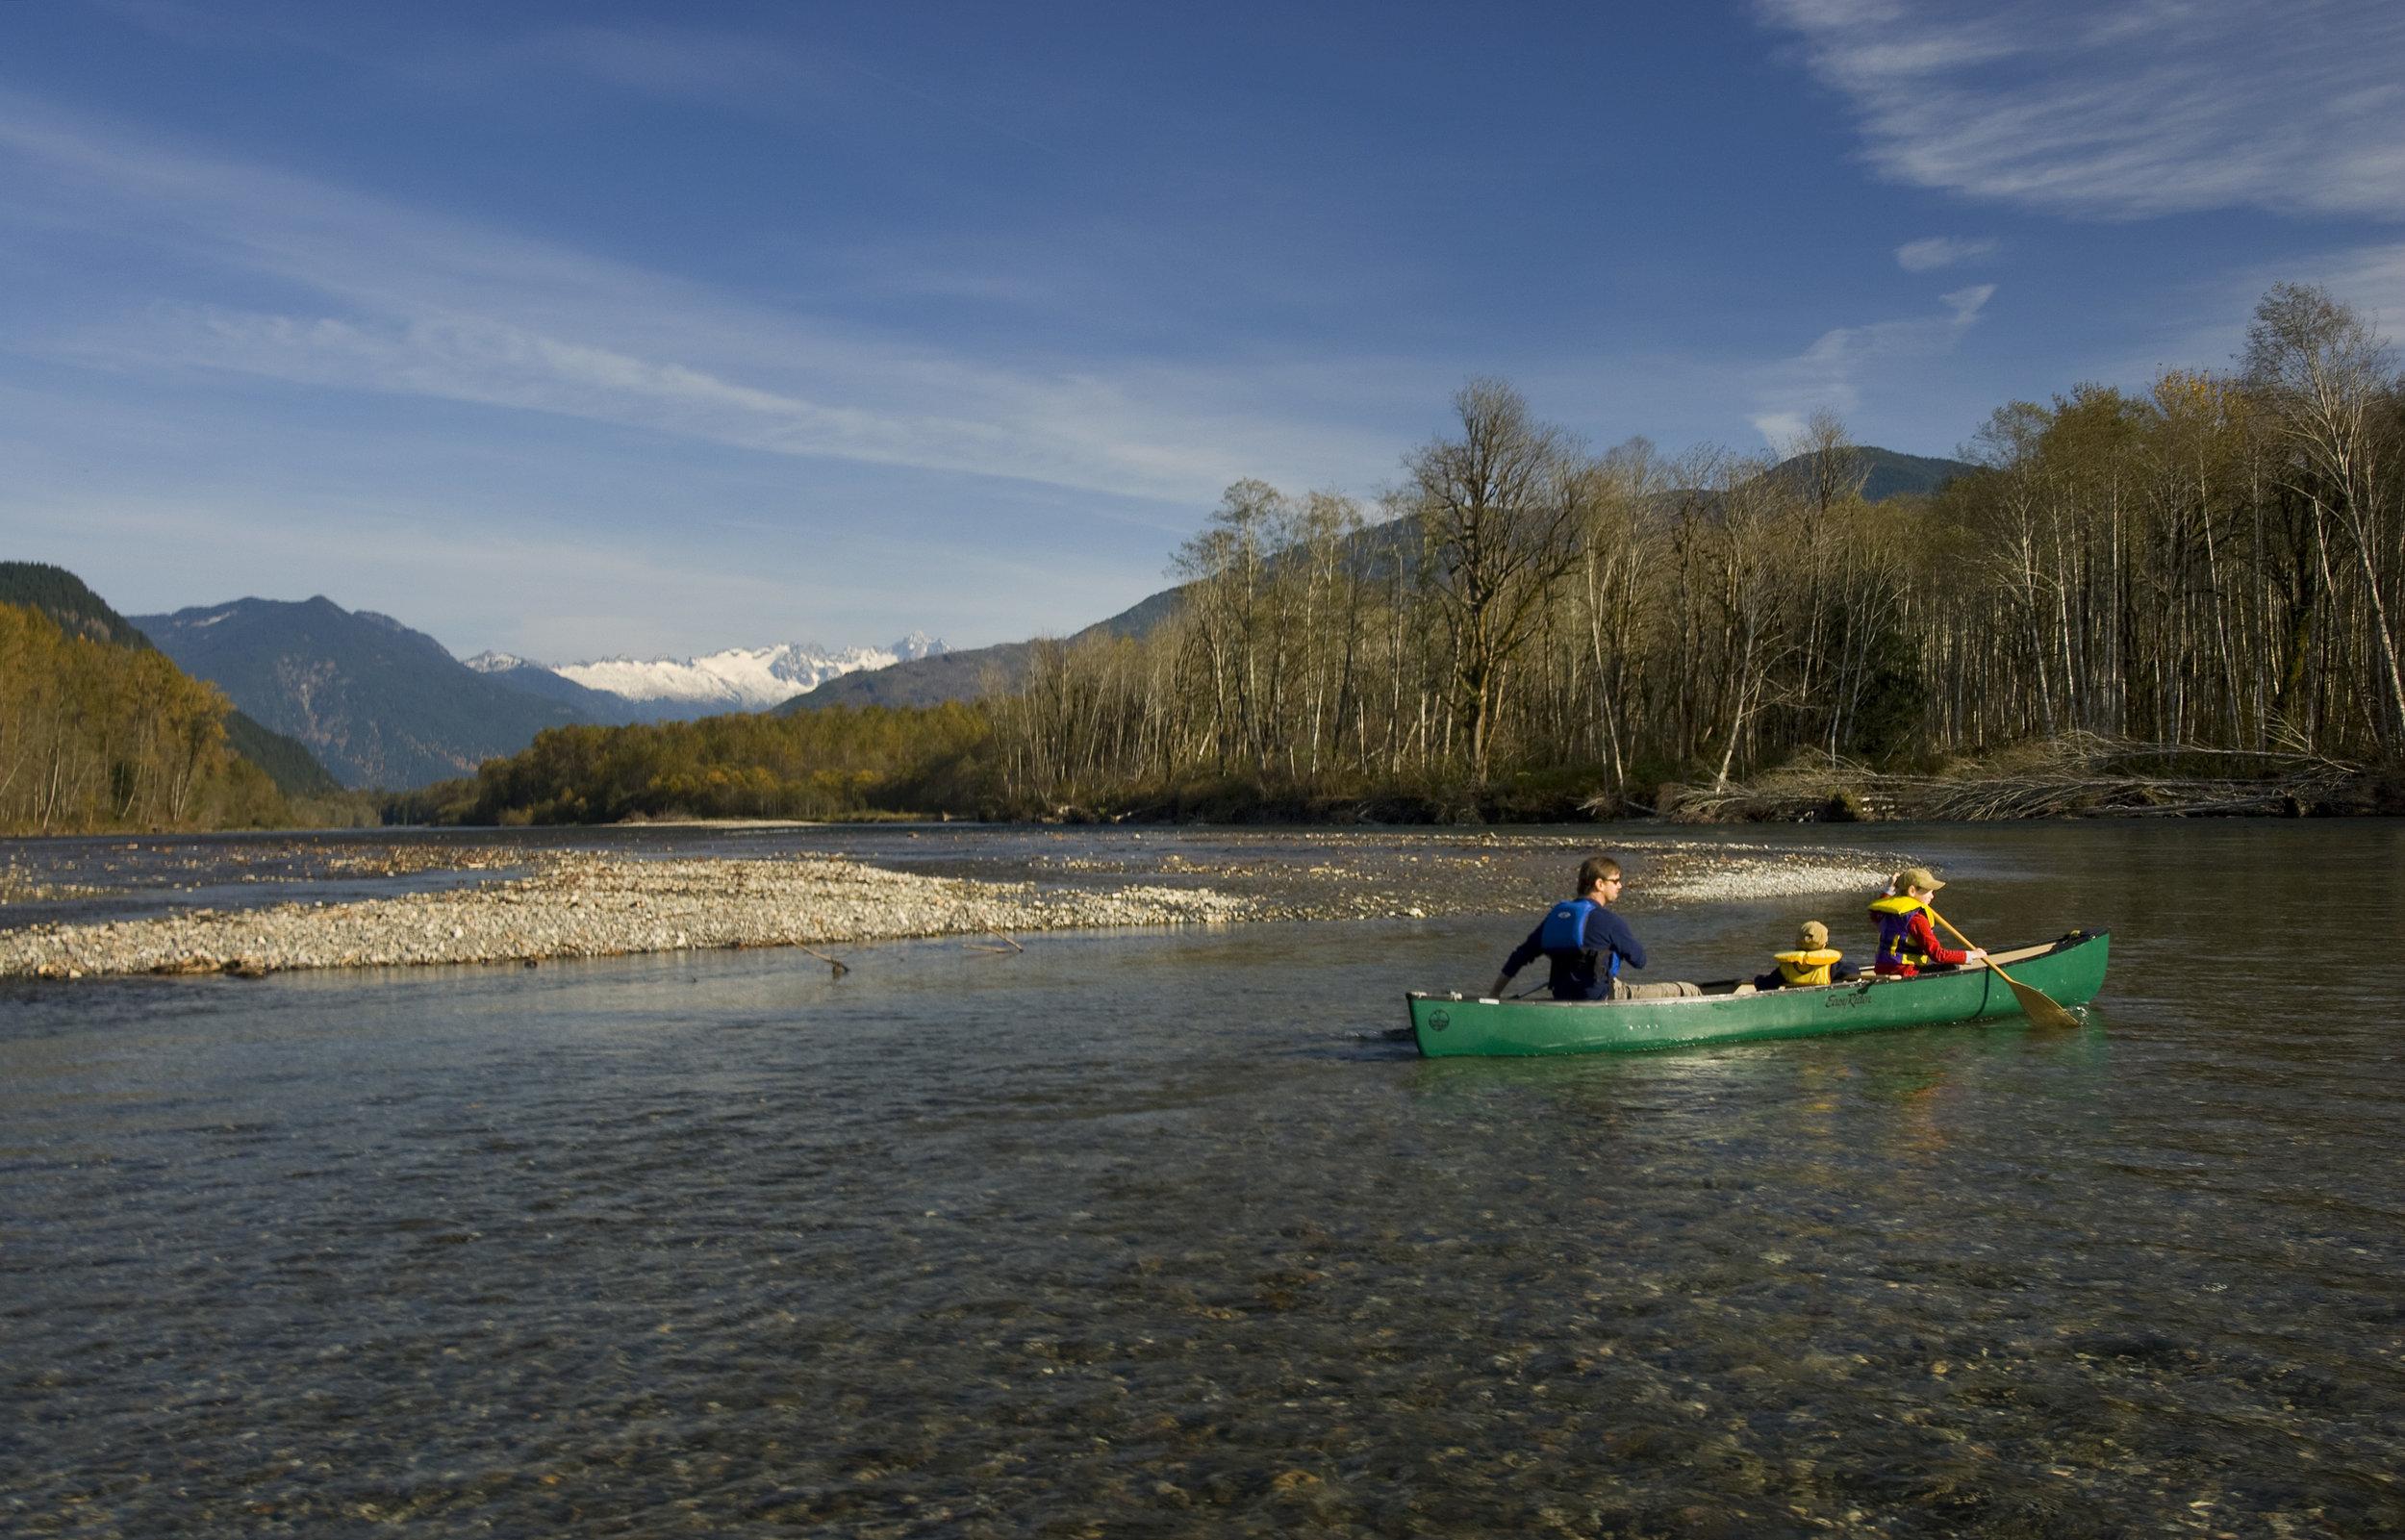 Canoeing on the Upper Skagit River. Photo ©Bridget Besaw.